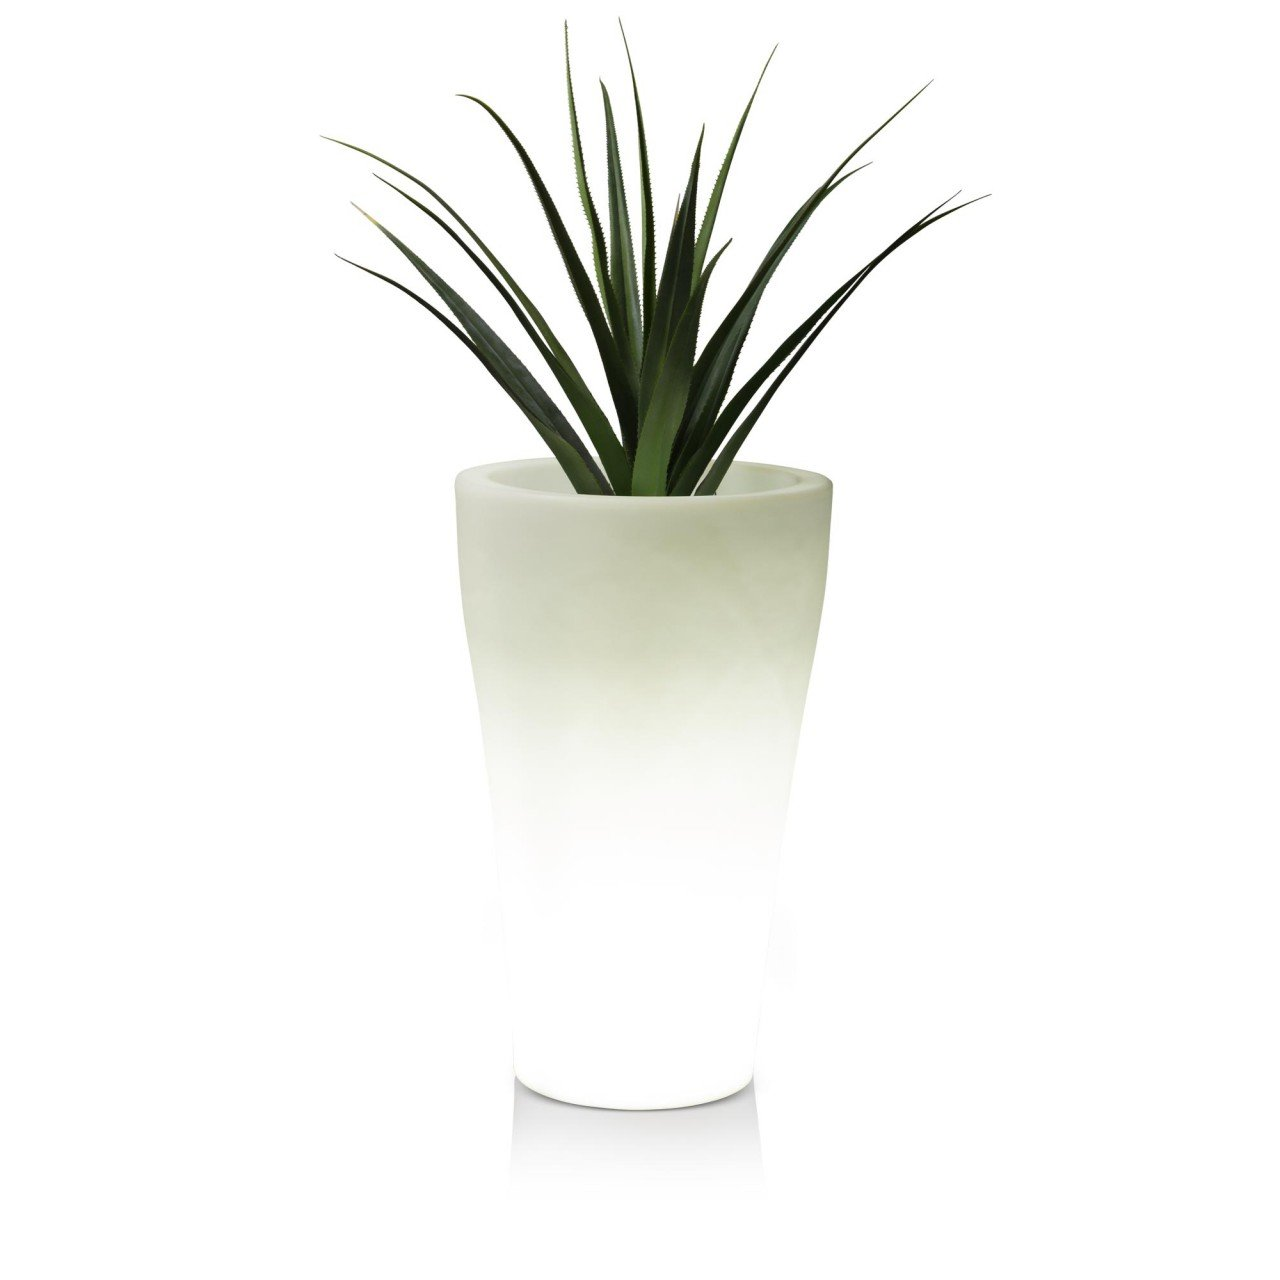 pflanzk bel blumenk bel flora luz 80 kunststoff 50x50x80 cm gartenleuchte blumentopf design. Black Bedroom Furniture Sets. Home Design Ideas